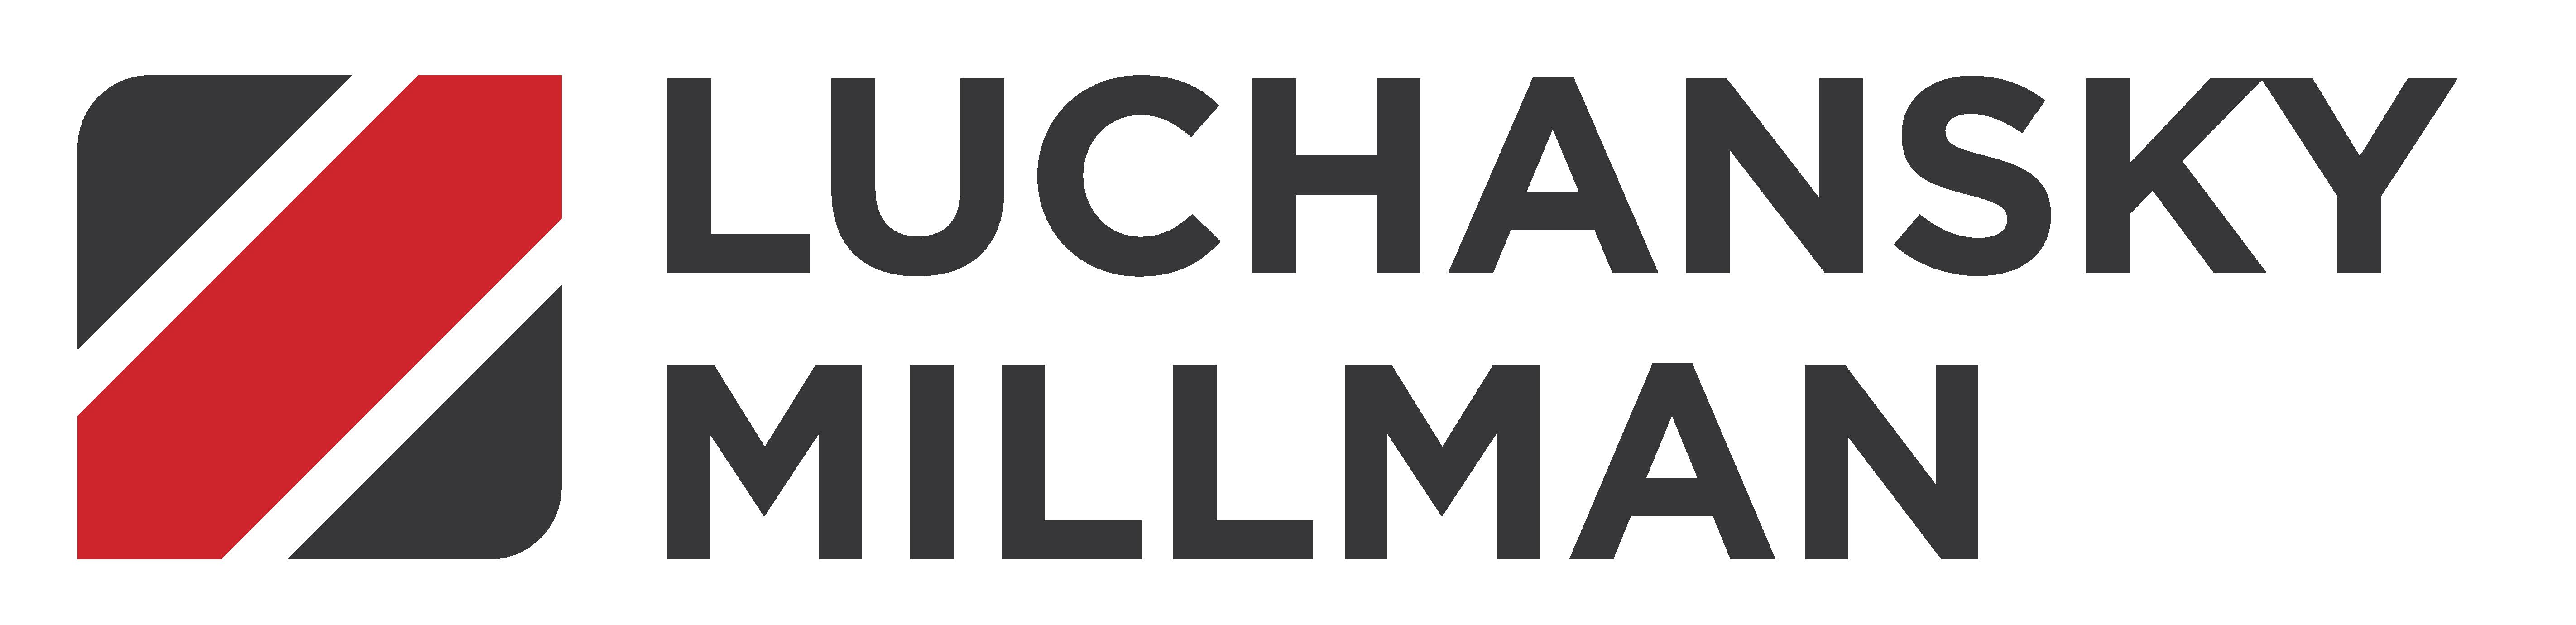 Luchansky Millman